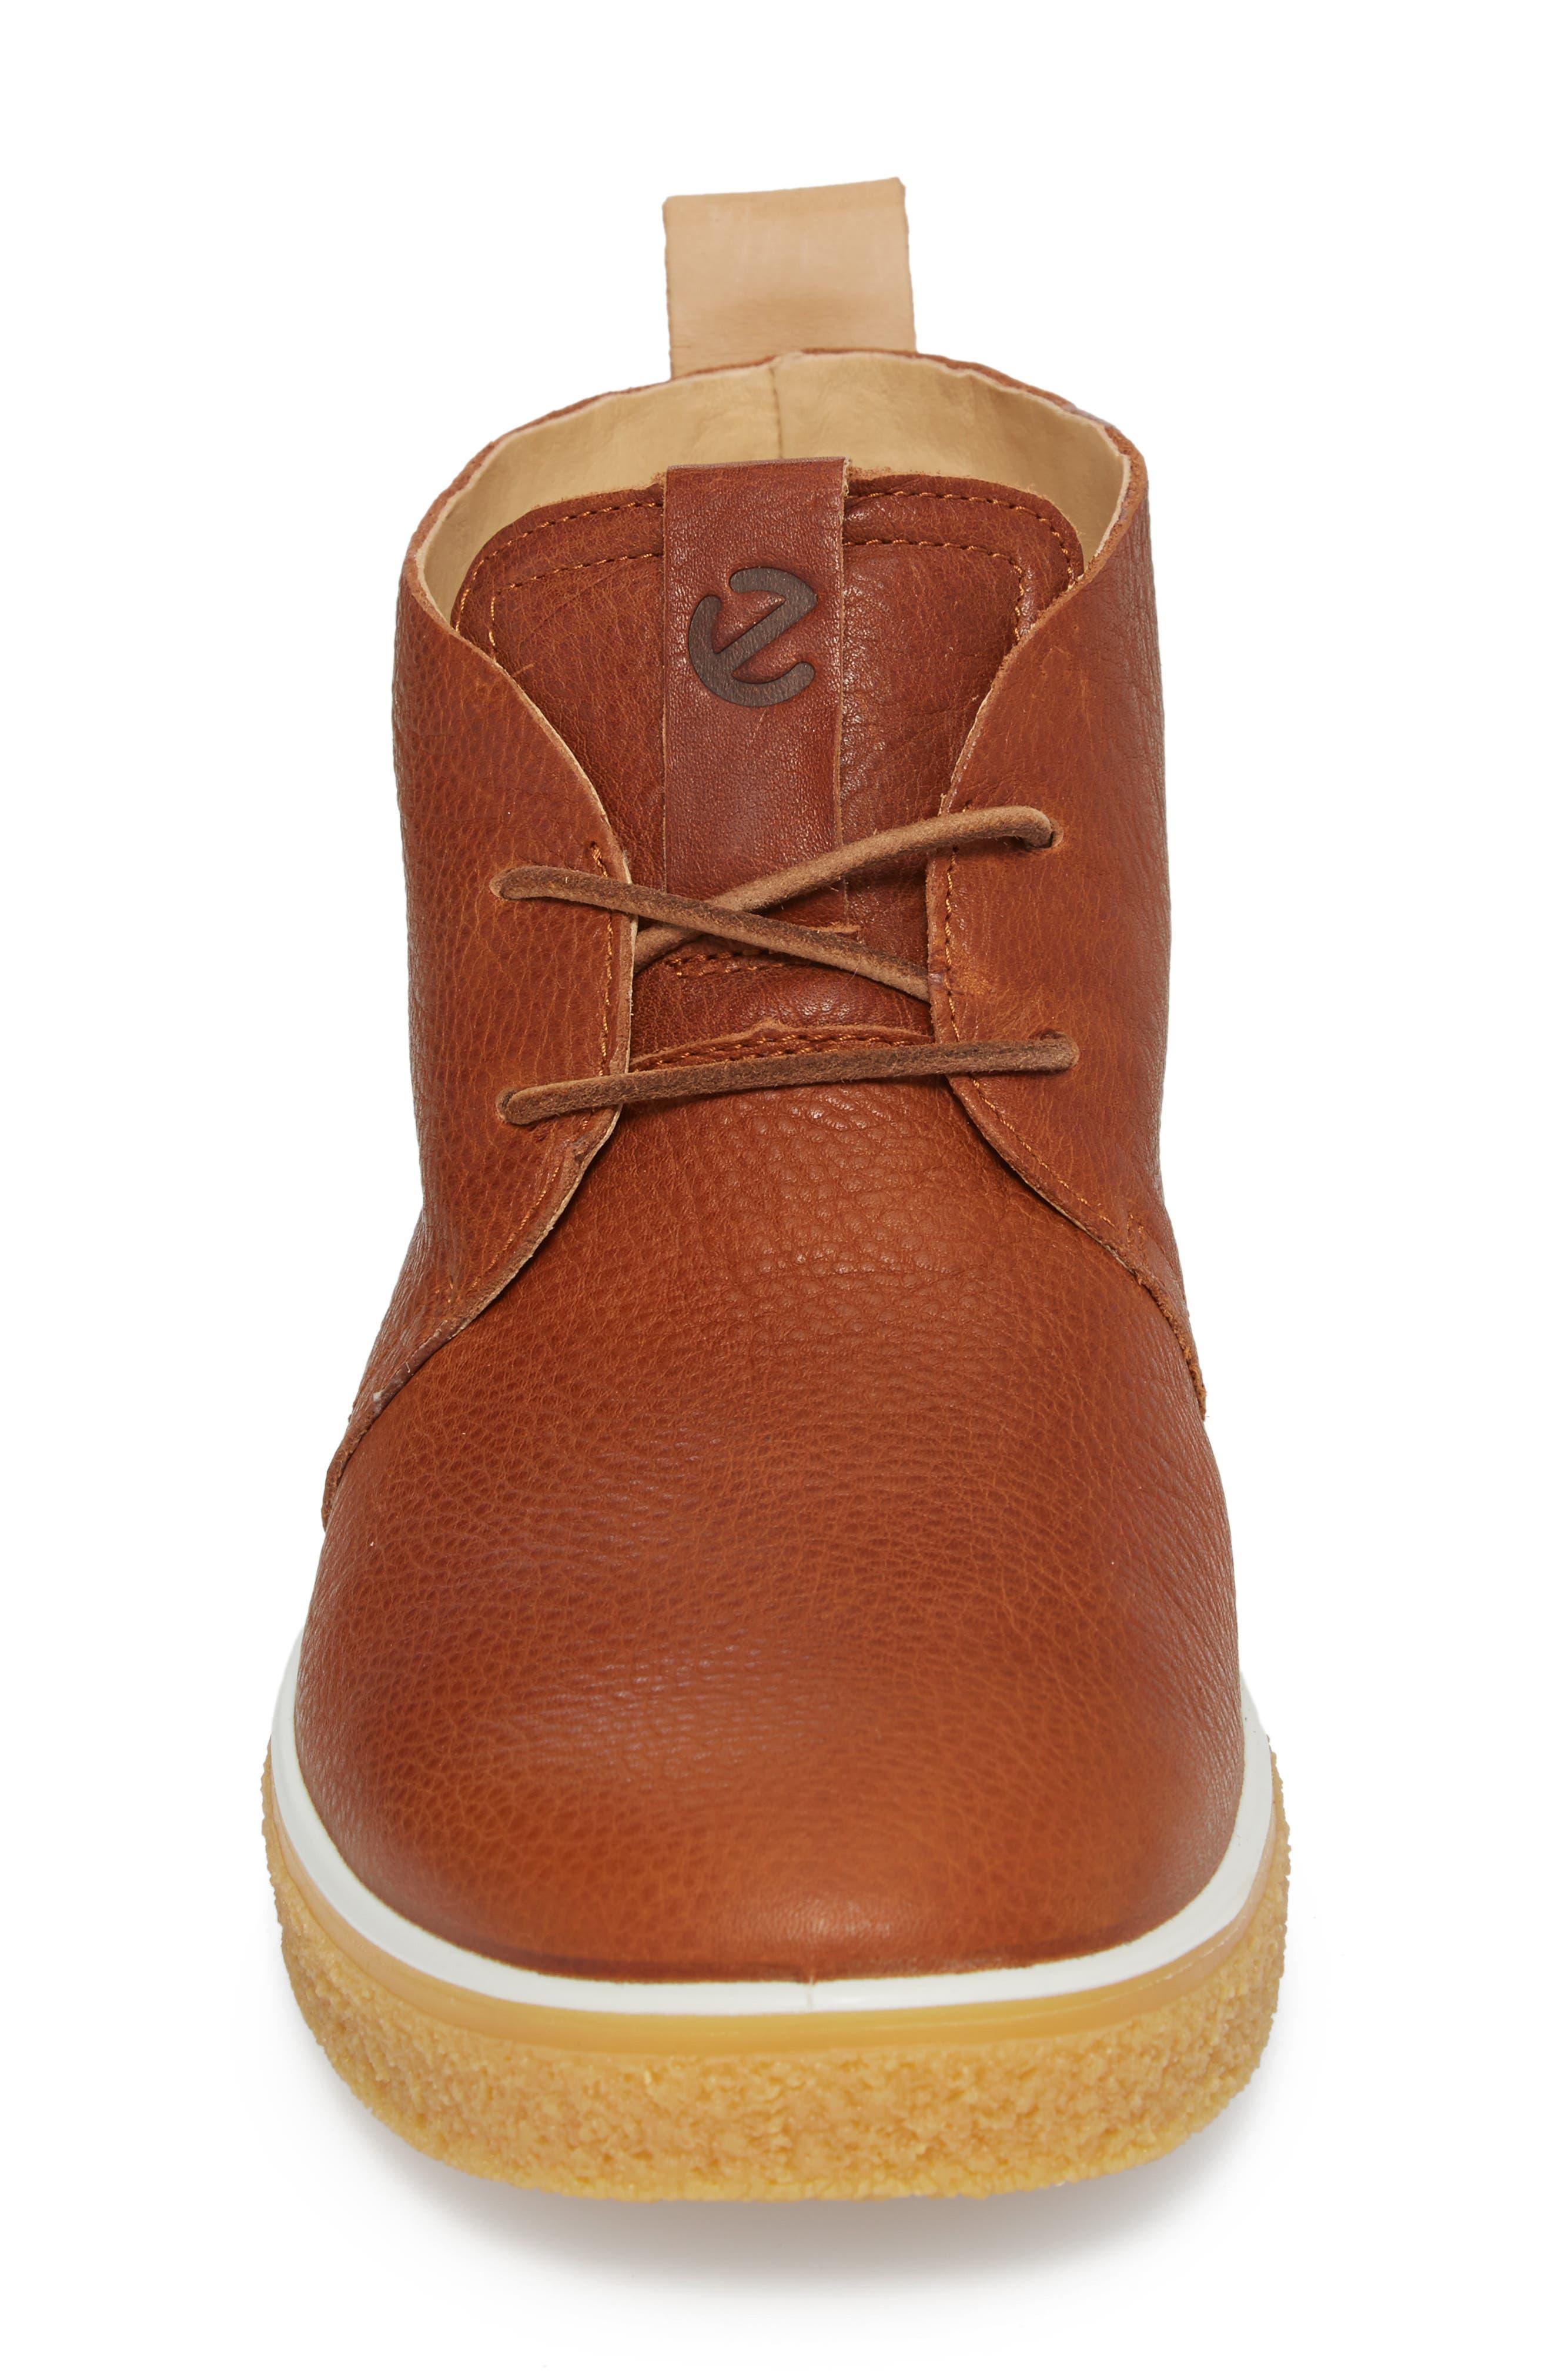 Crepetray Chukka Boot,                             Alternate thumbnail 4, color,                             Lion Leather